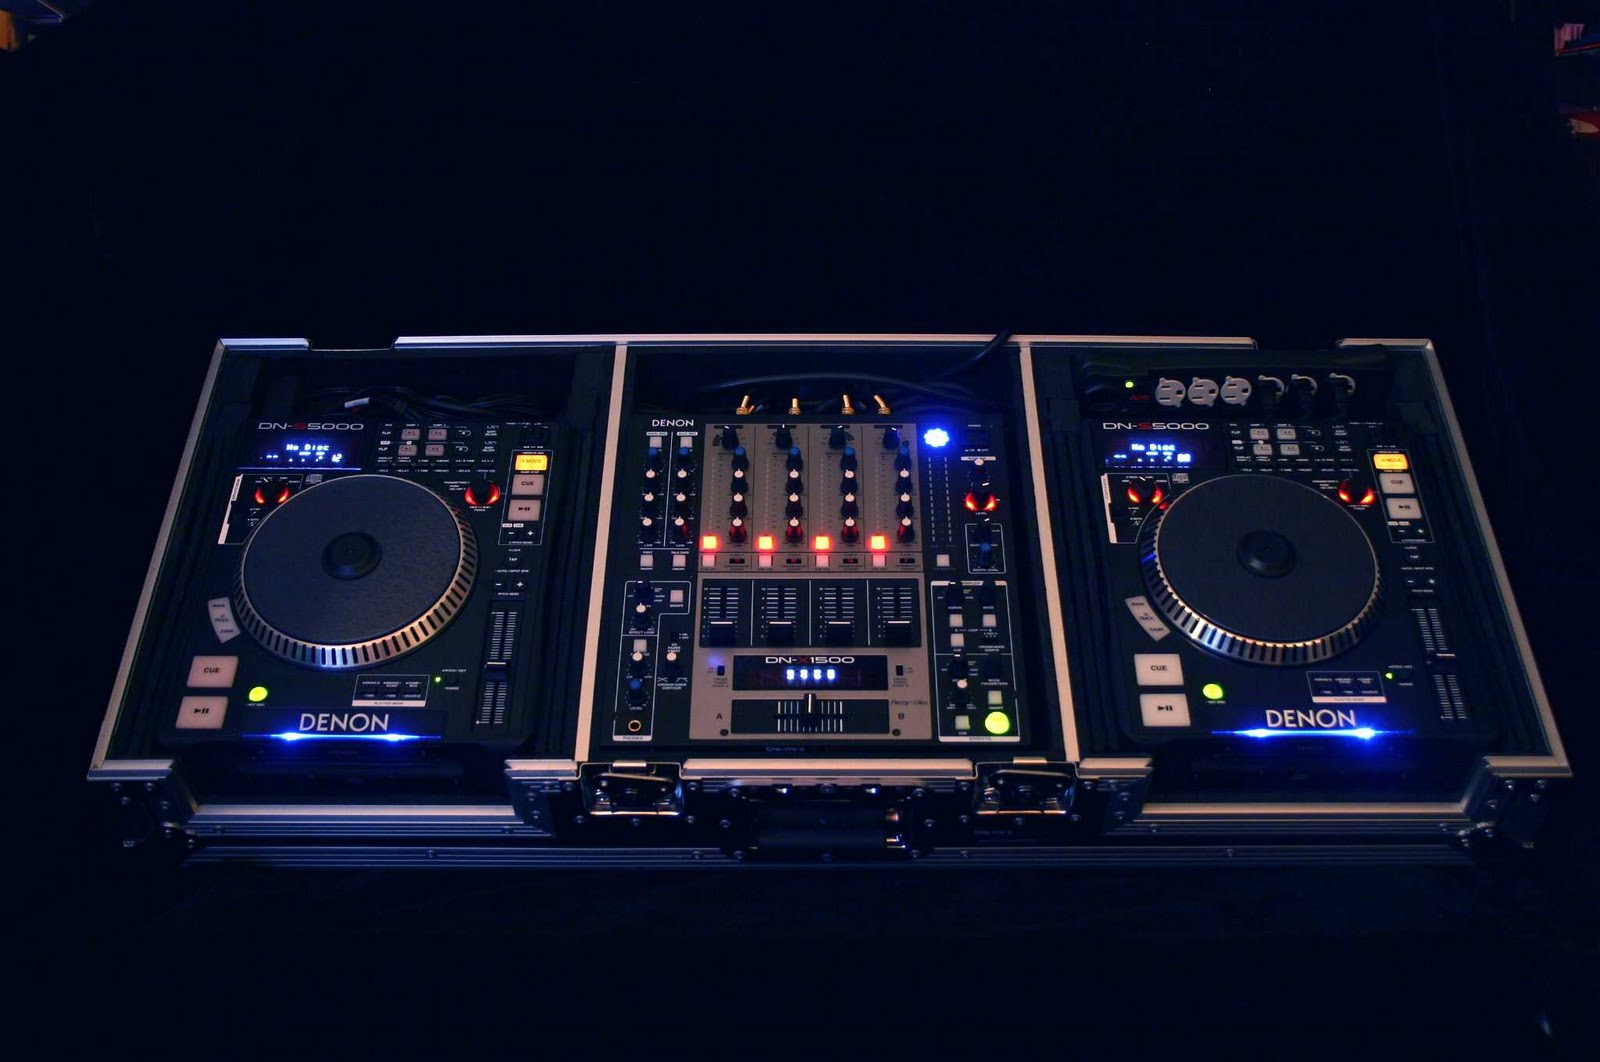 http://2.bp.blogspot.com/-tFZBSTHzBek/Tci6rmozUnI/AAAAAAAAACc/qxOAReYDZMs/s1600/Denon+Pro+DJ+System+1.jpg